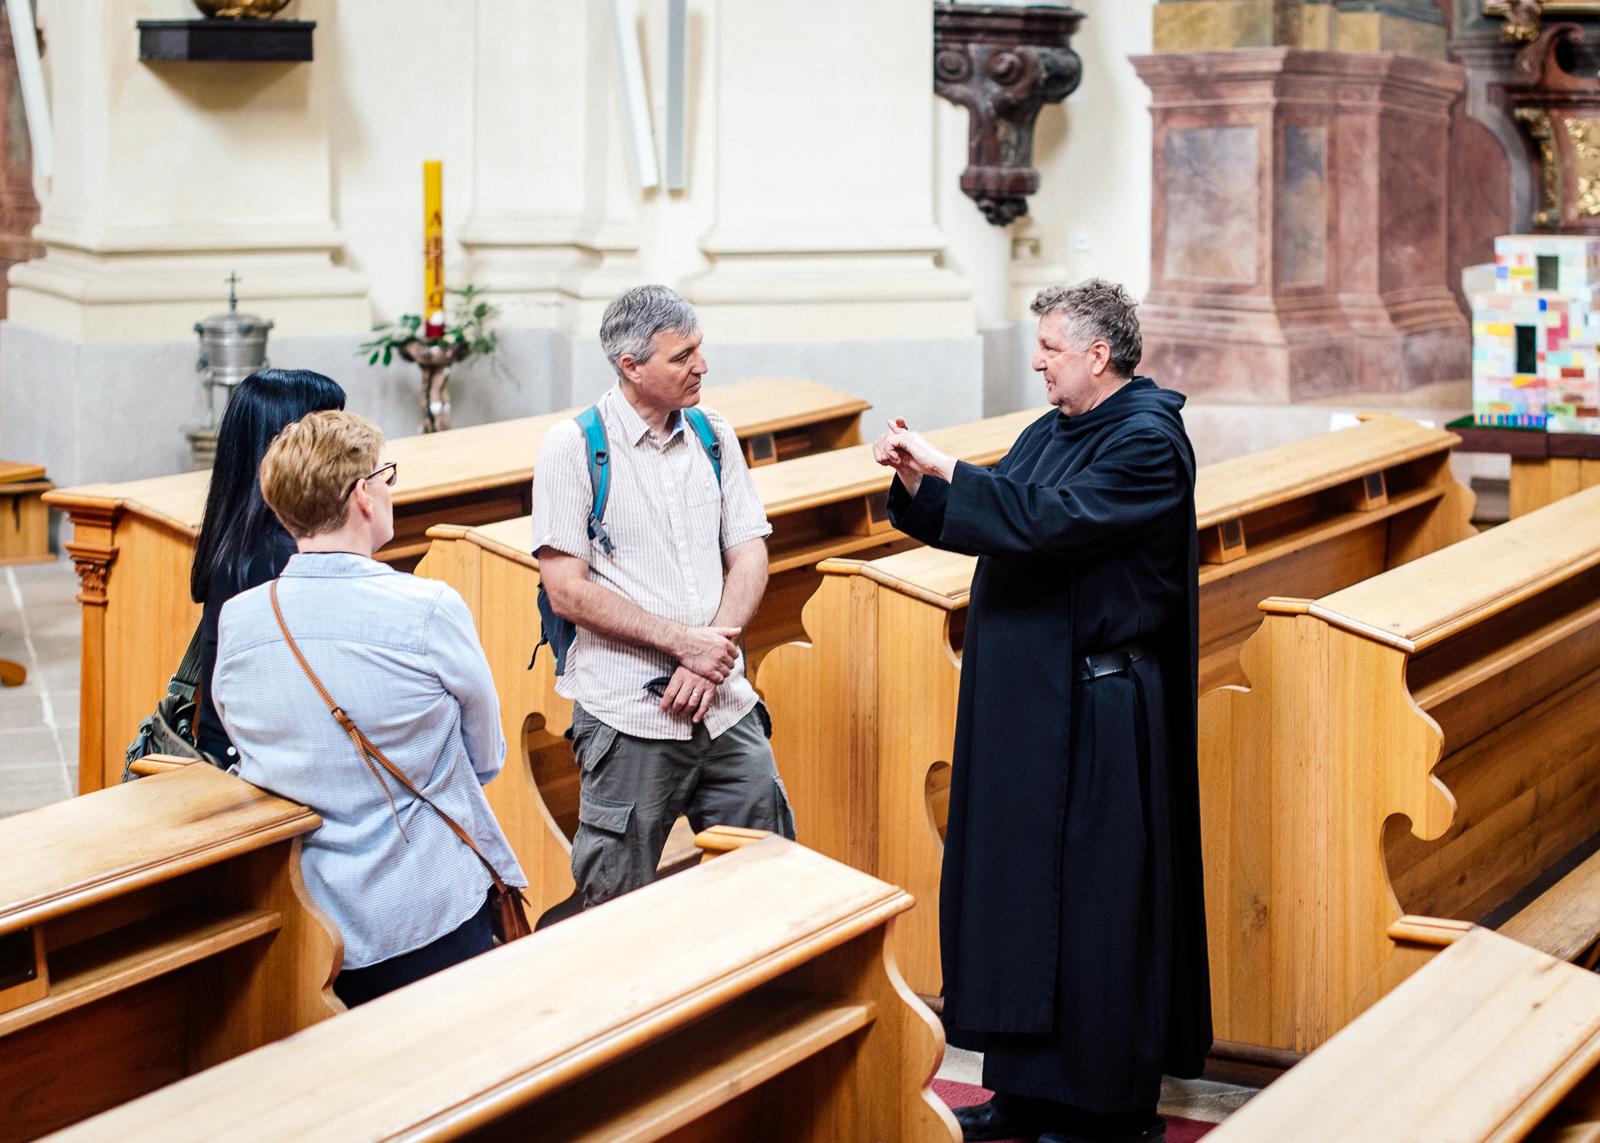 monk explaining the history of the monastery